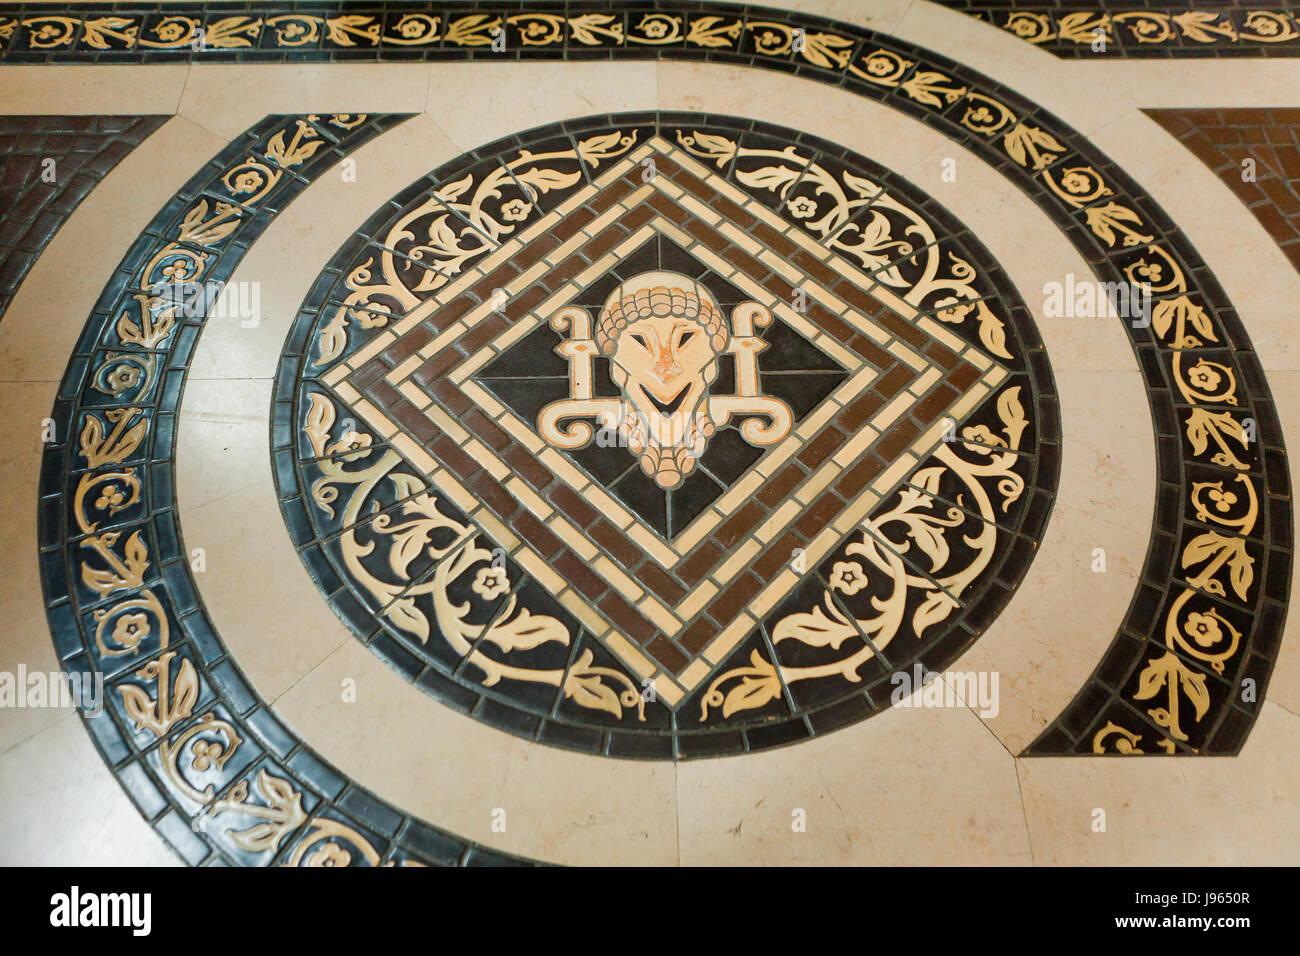 Mosaic terracotta floor tiles of the Great Hall, Folger Shakespeare Library (Folger Shakespeare Theatre) - Washington, - Stock Image